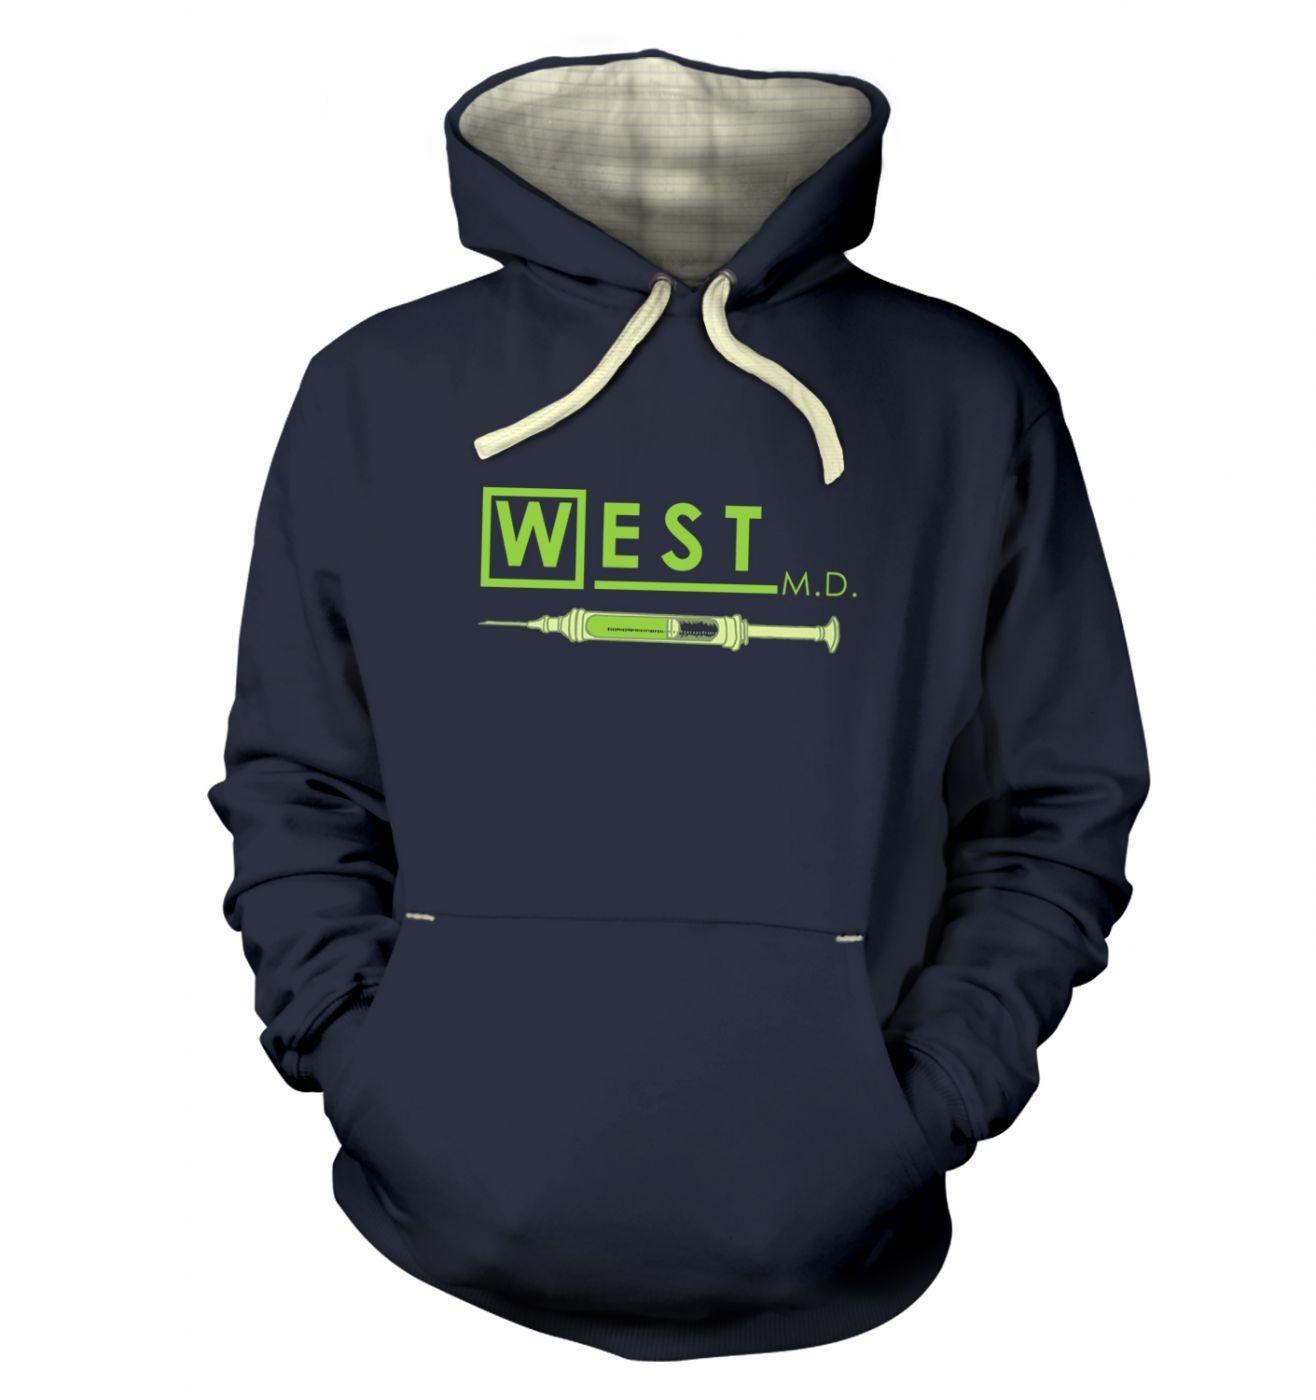 West MD HP Lovecraft hoodie (premium)